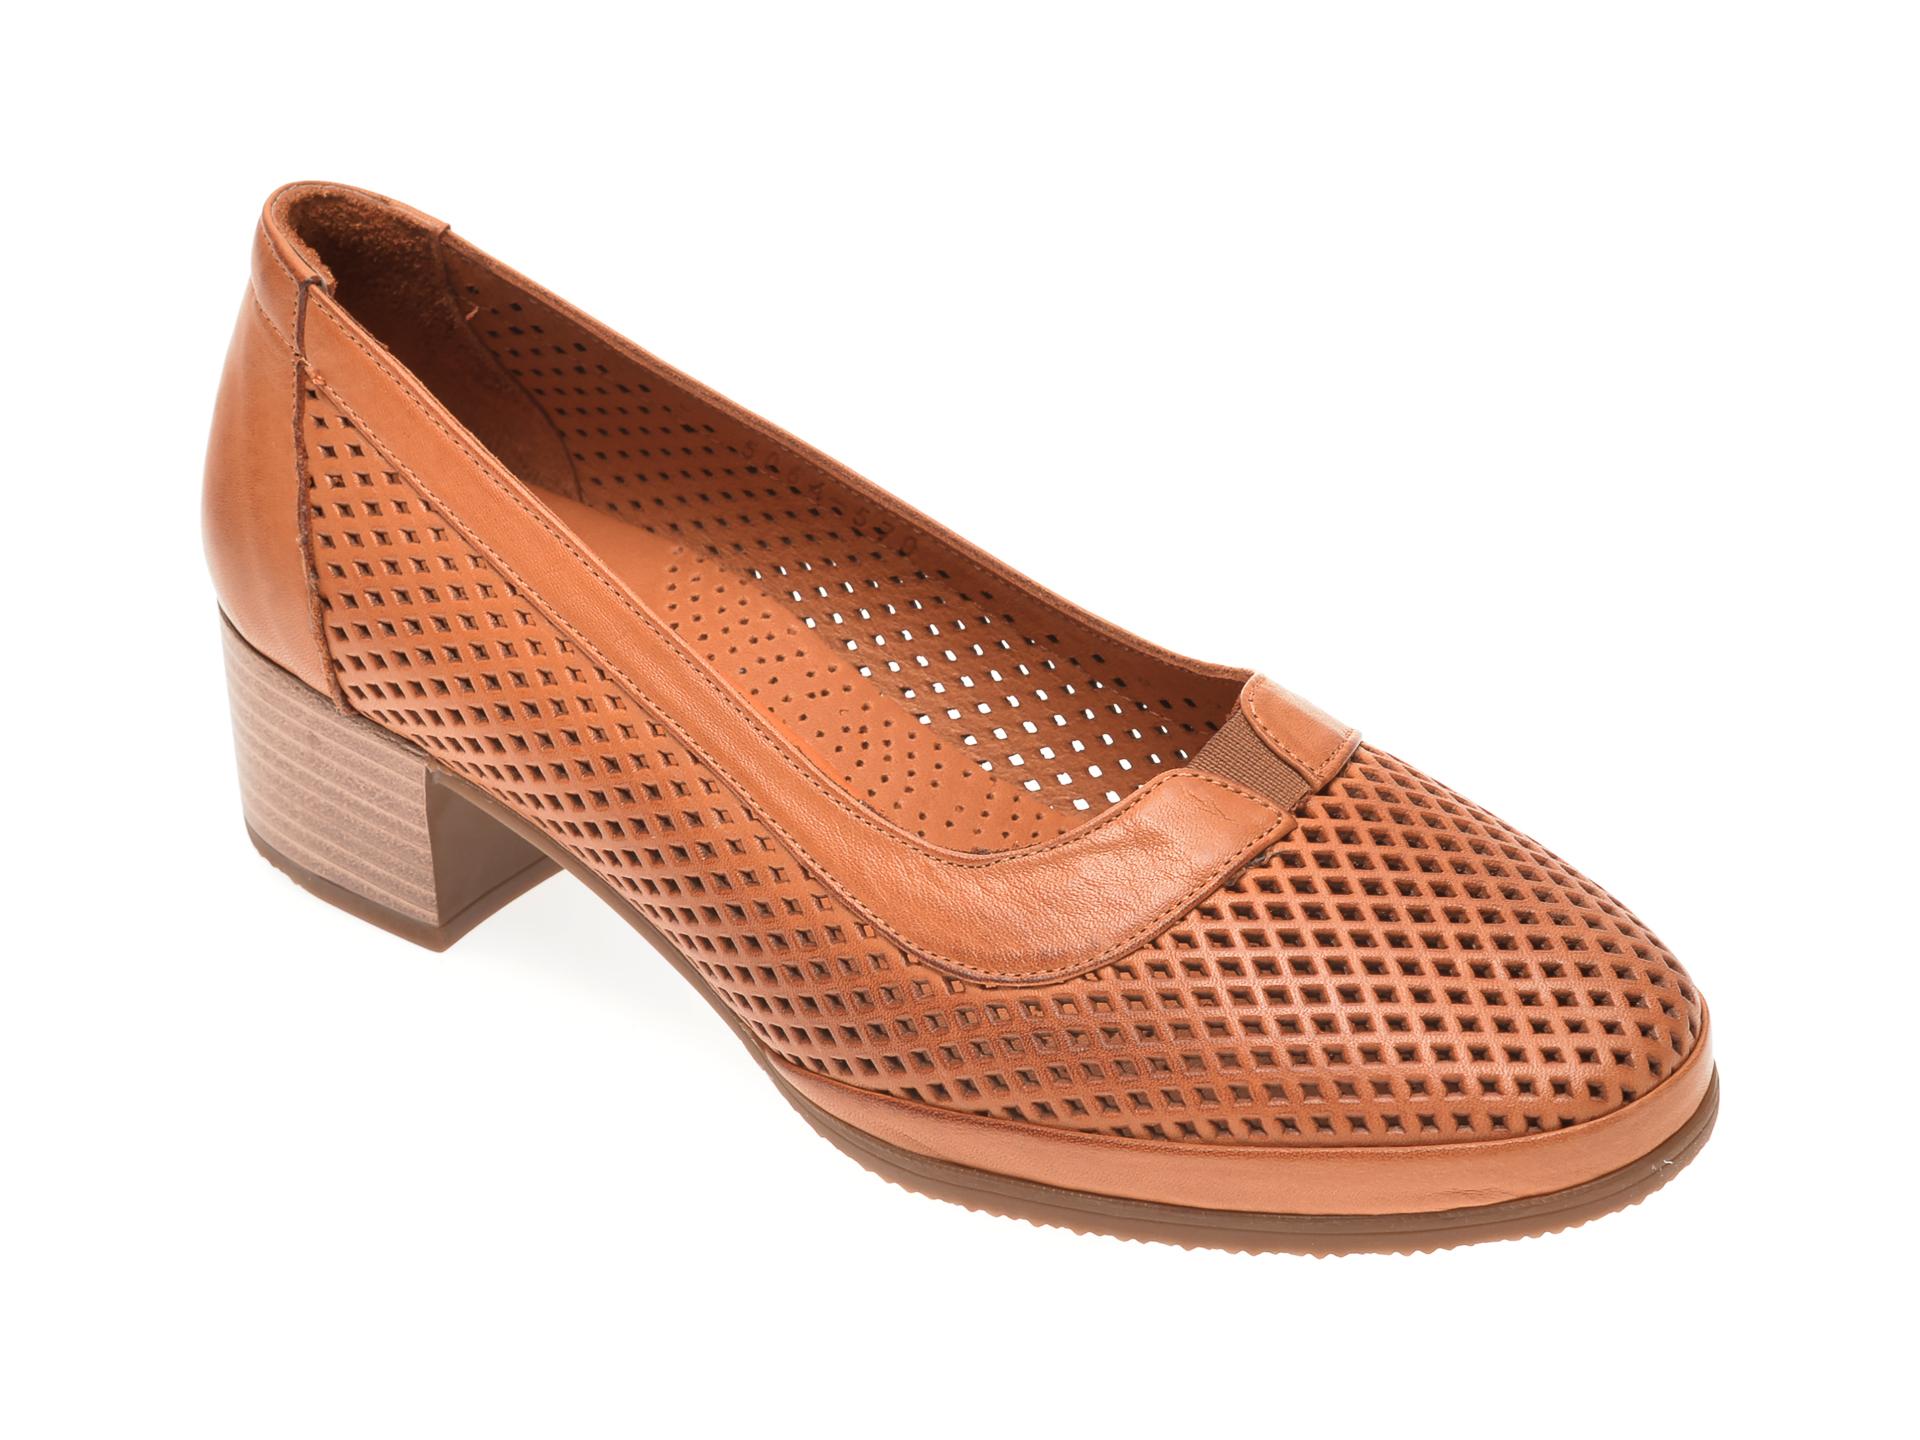 Pantofi FLAVIA PASSINI maro, 0105064, din piele naturala imagine